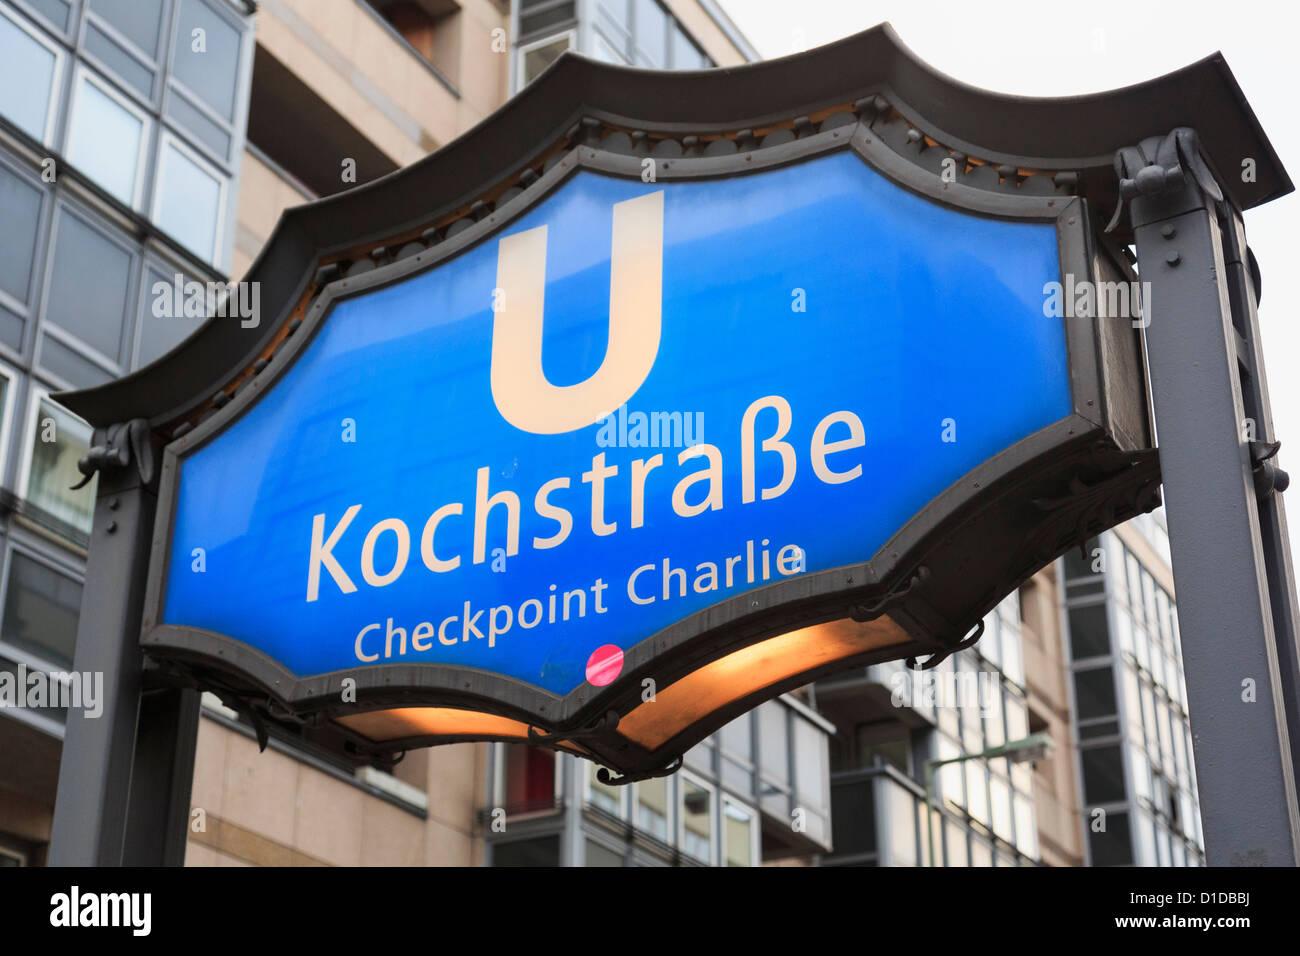 Bhf Kochstrasse underground station sign for Checkpoint Charlie on Friedrichstrasse, Berlin, Germany, Europe. - Stock Image